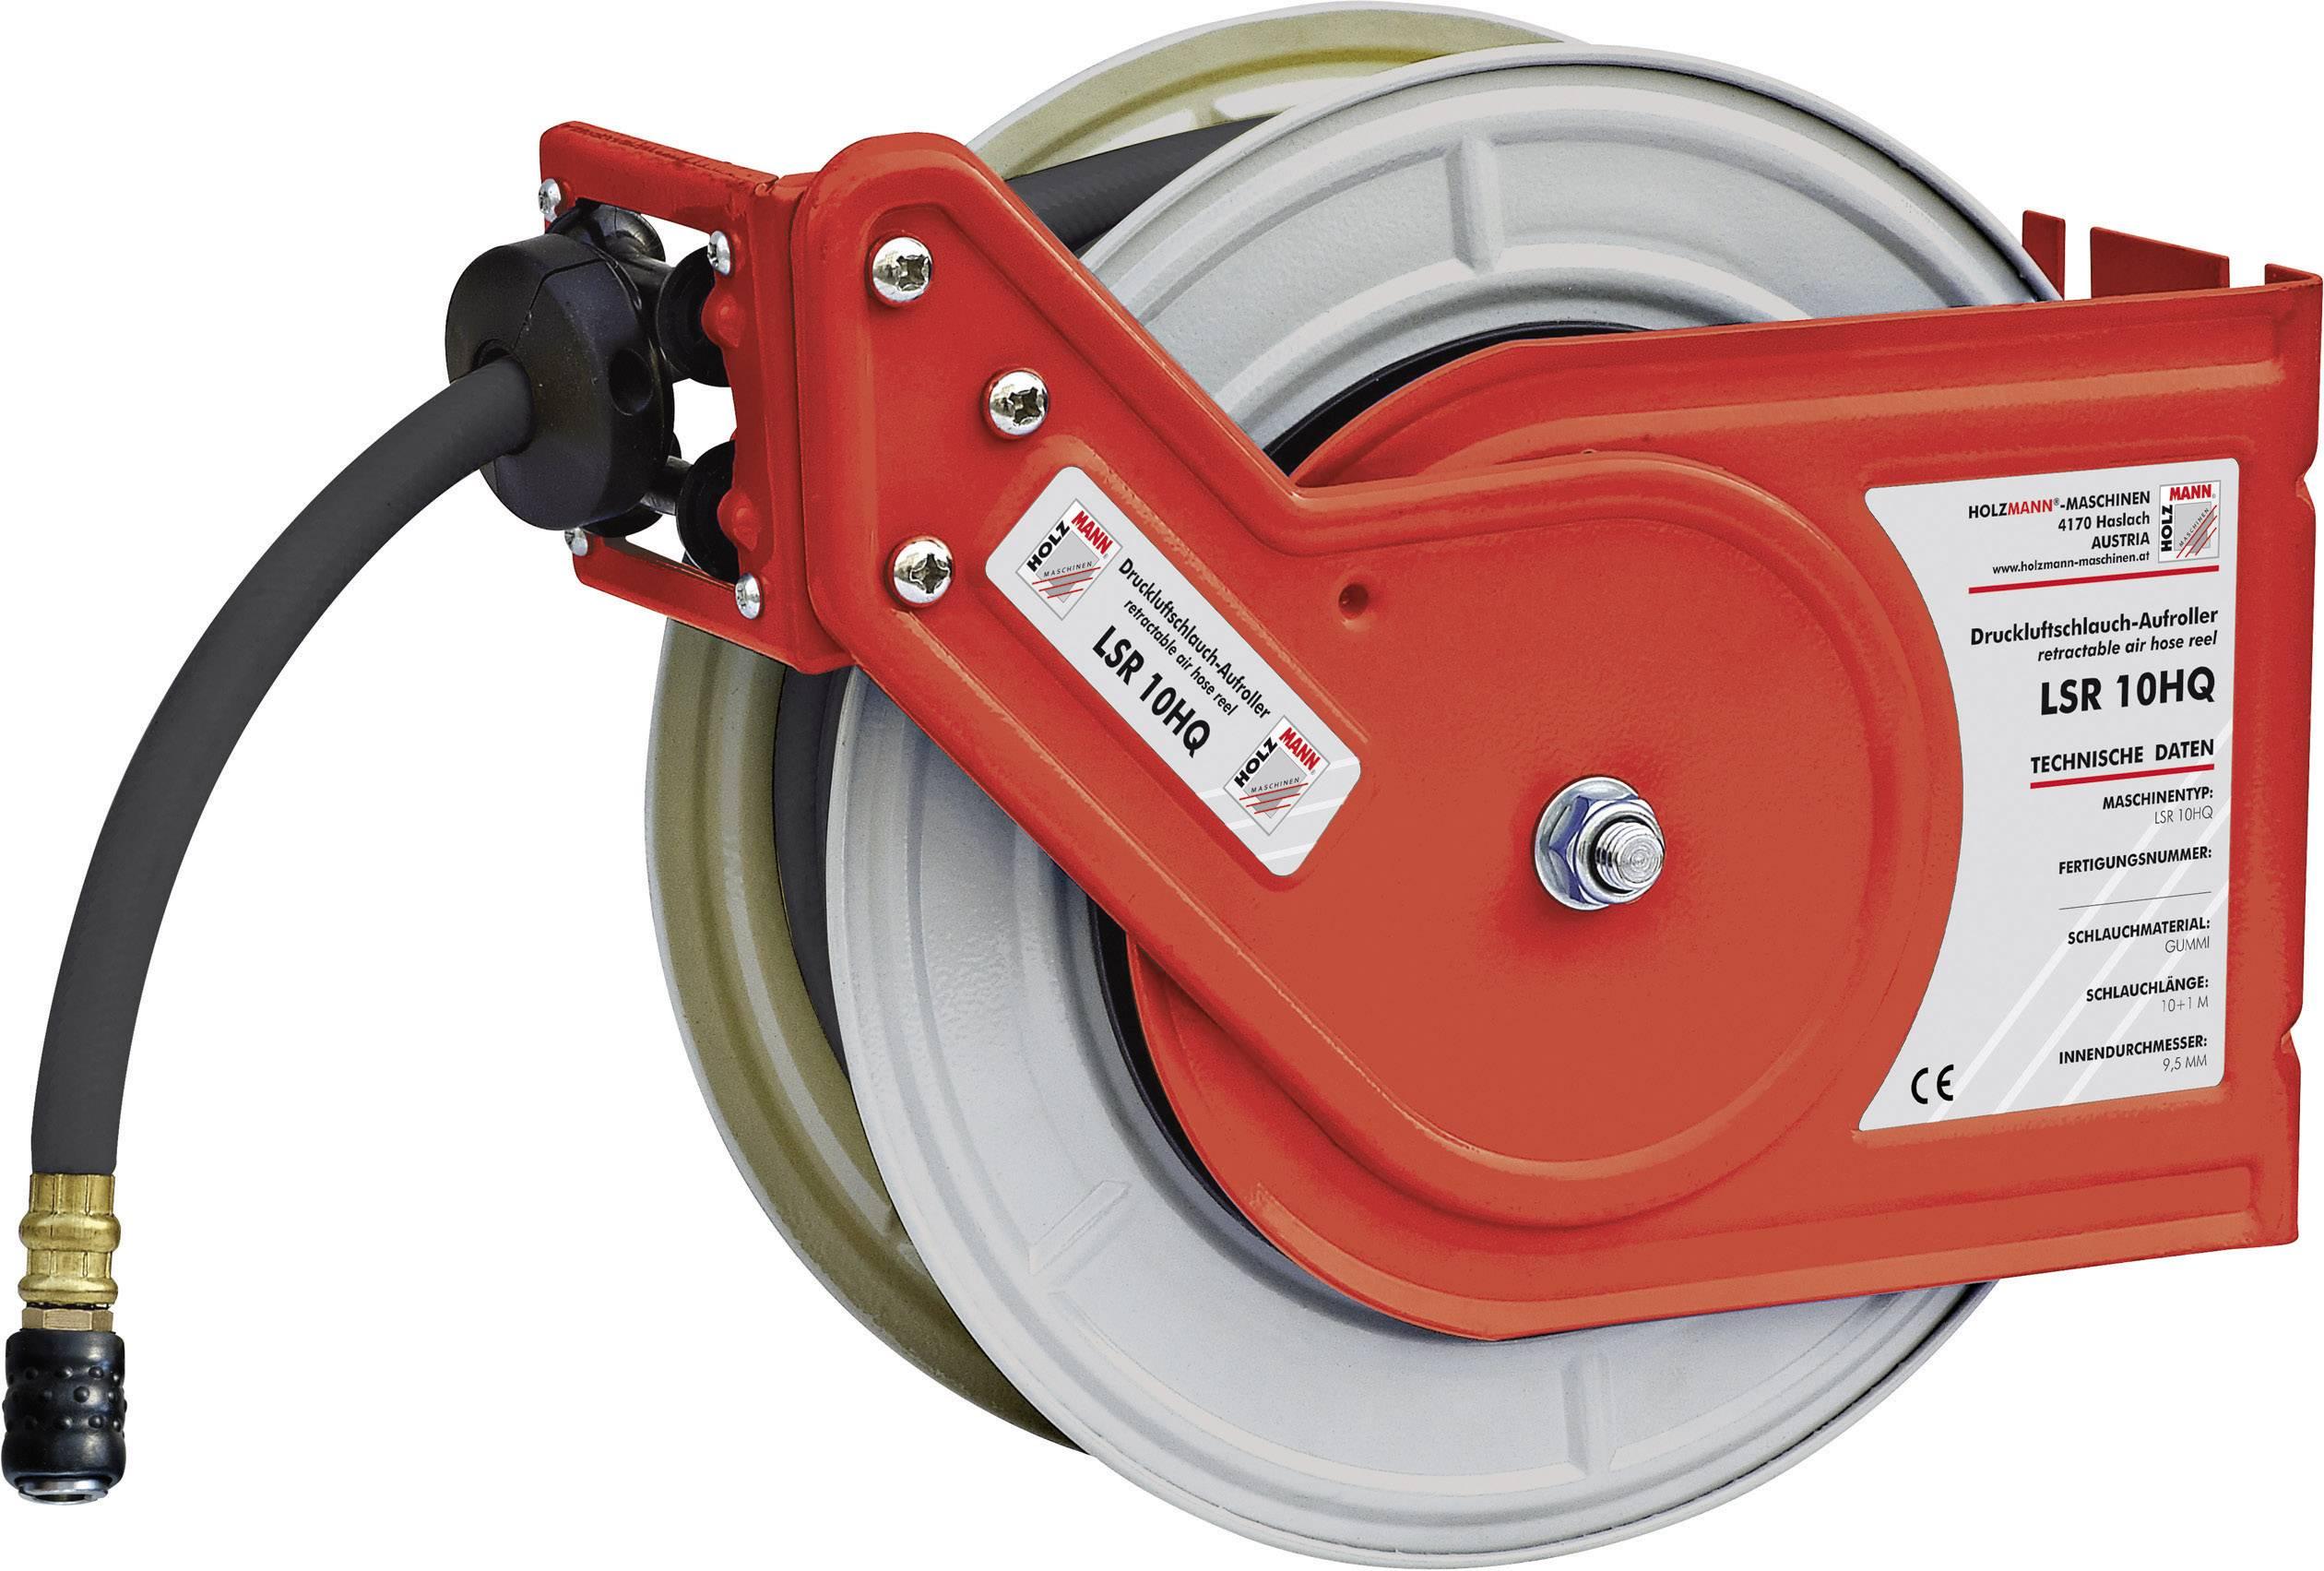 Navíjecí buben na tlakovou hadici Holzmann Maschinen LSR10HQ H050400006, 10 m